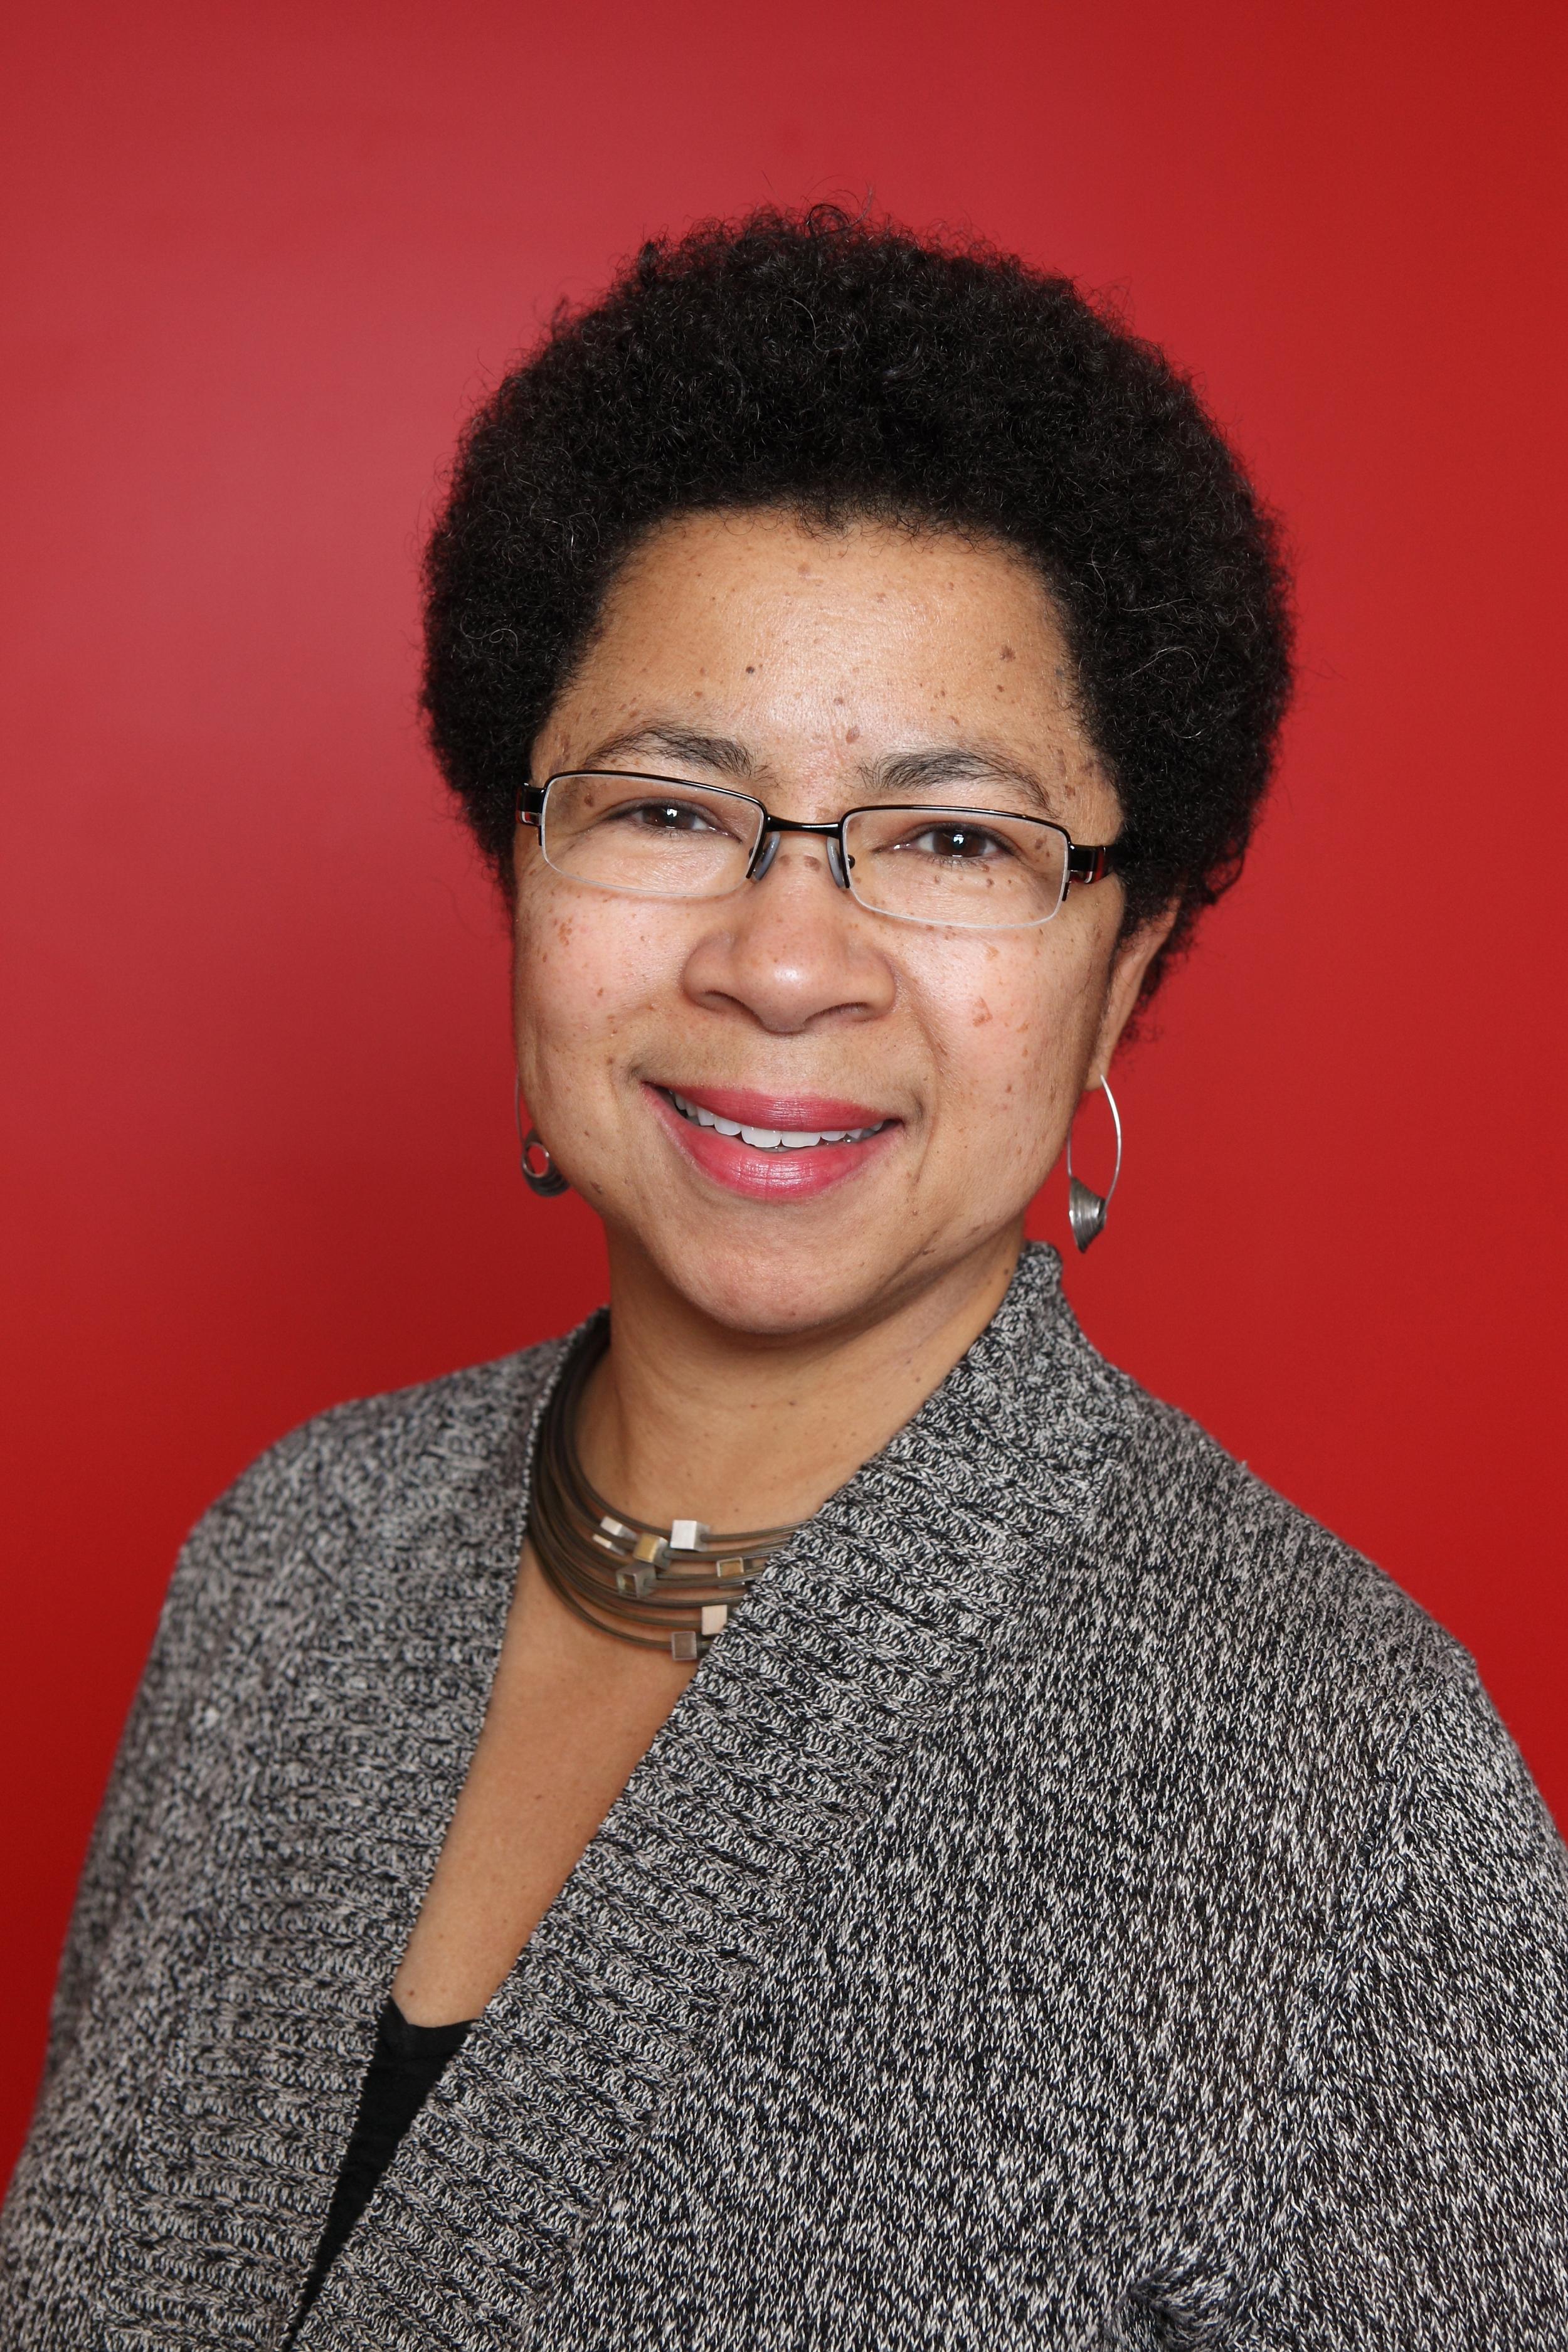 Barbara Ransby, Historian/Writer/Activist, Author of Ella Baker & The Black Freedom Movement, @BarbaraRansby